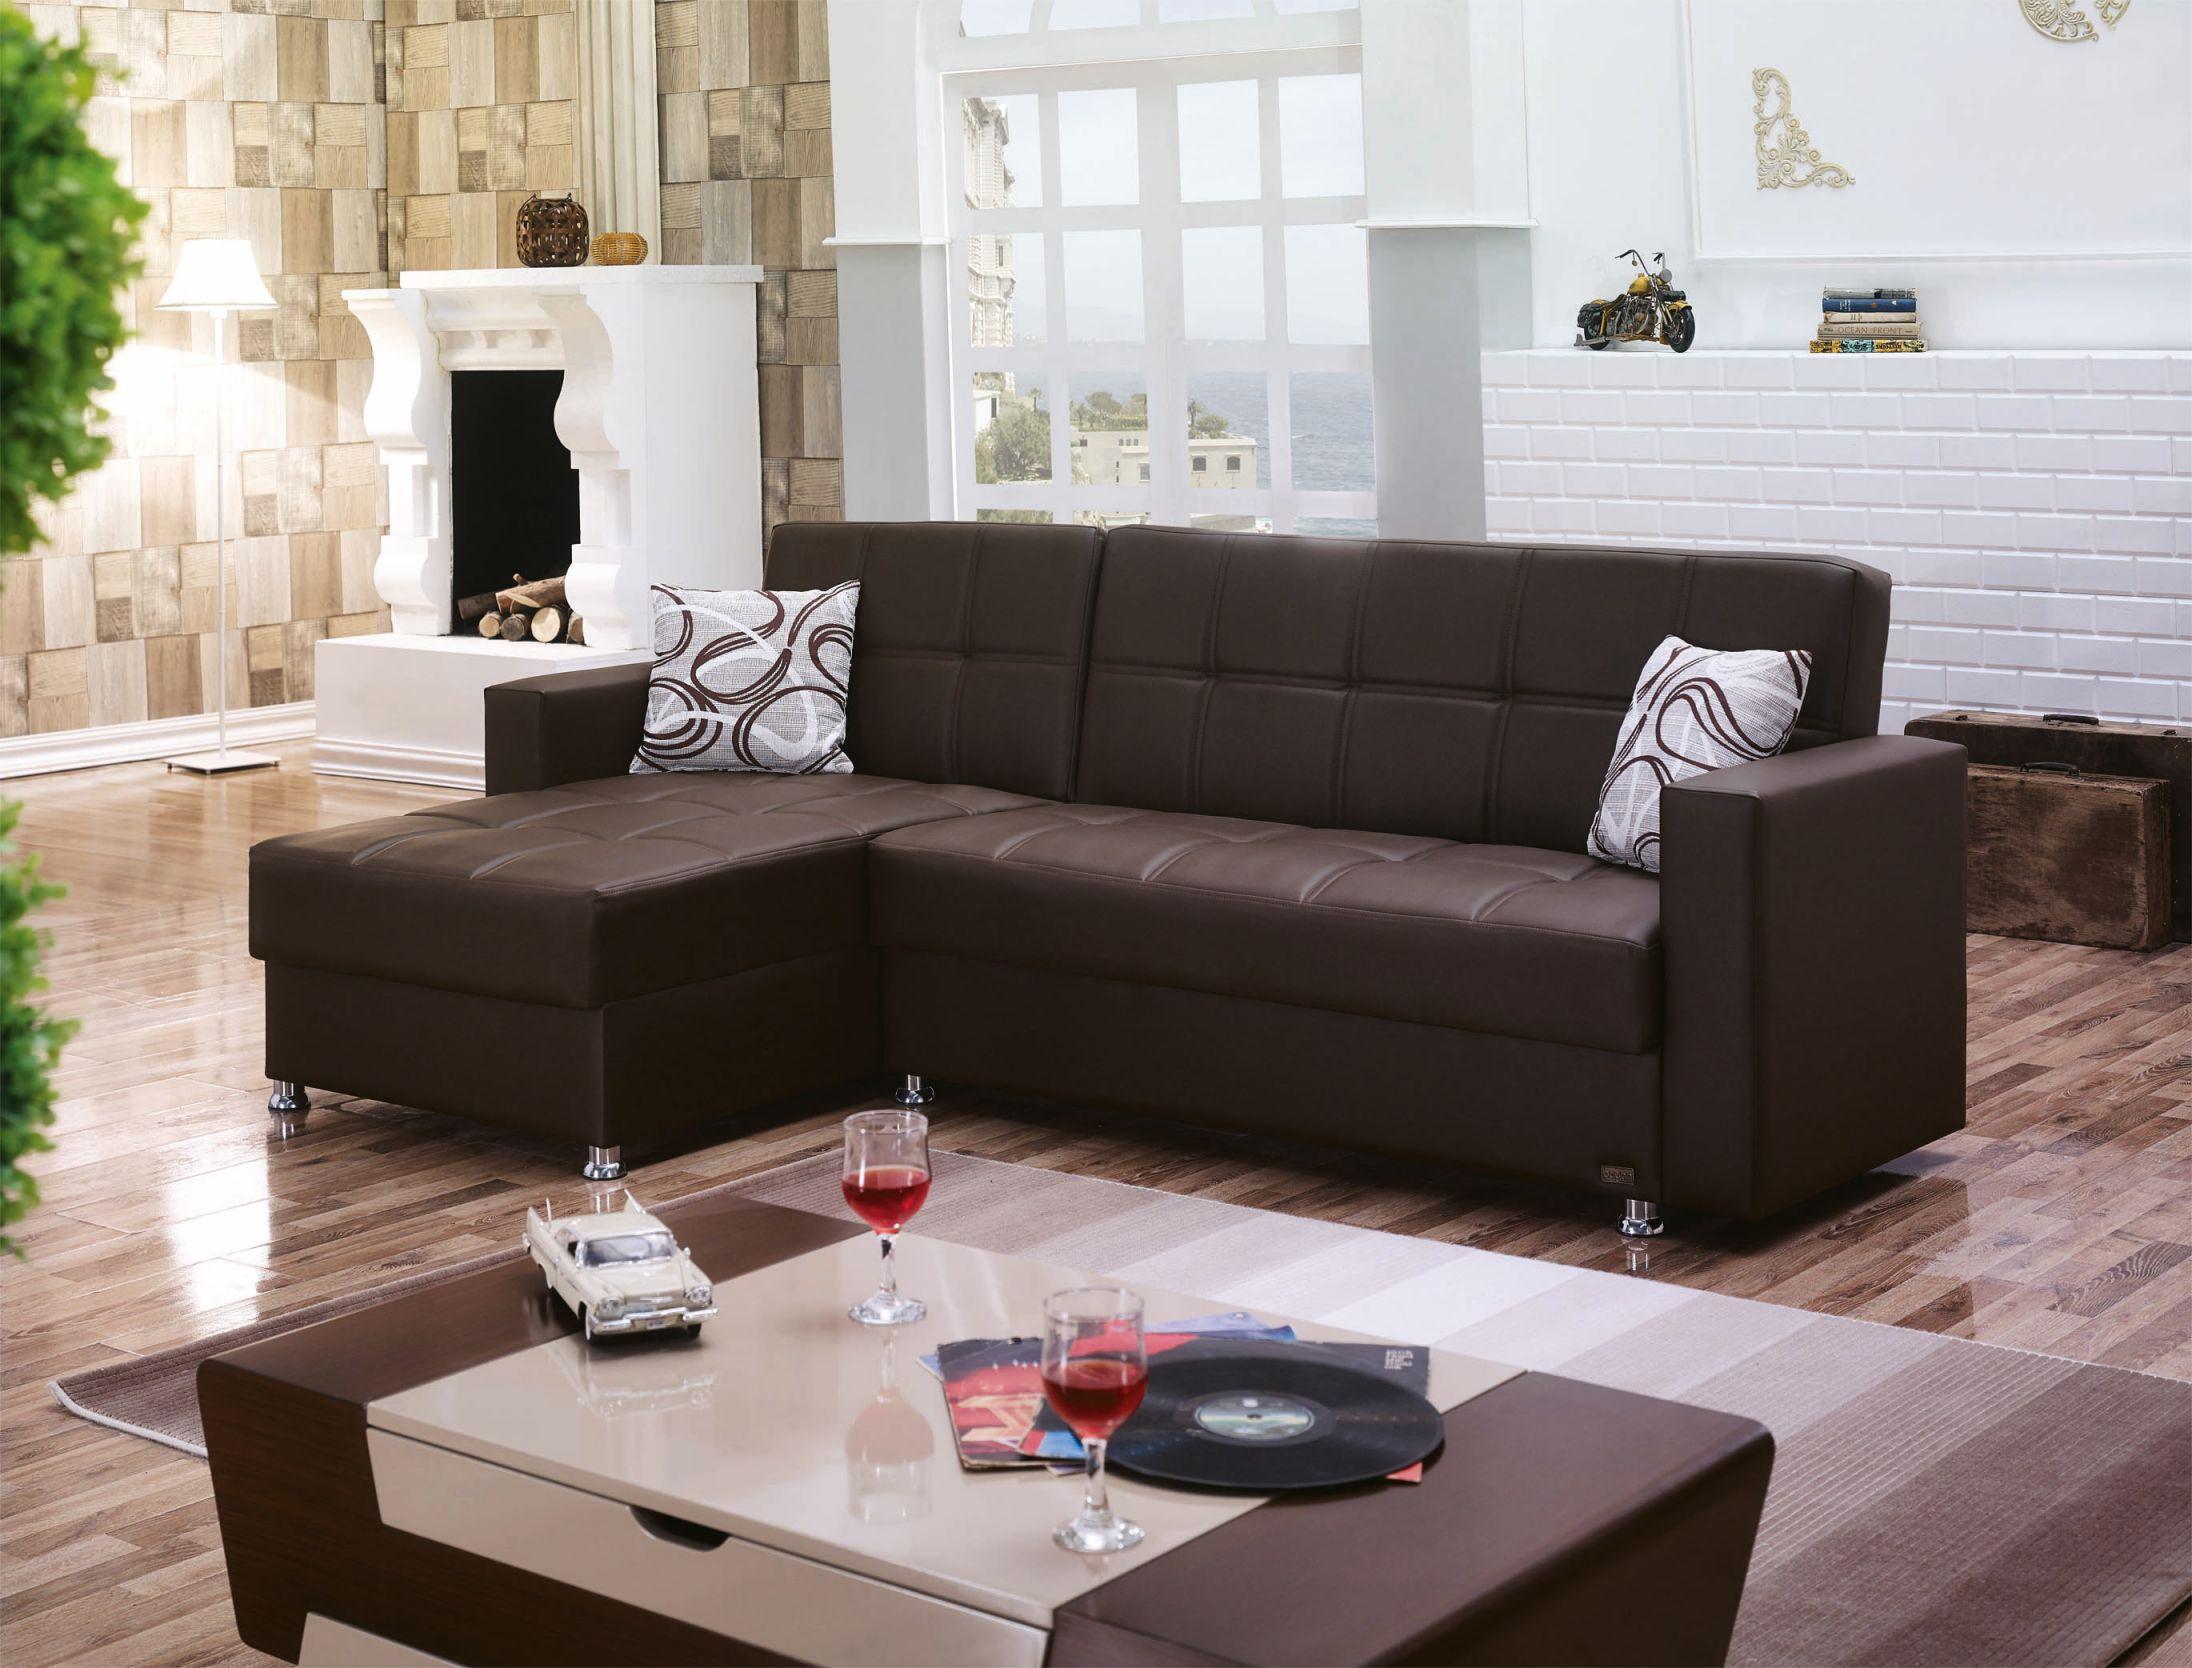 M Dark Brown Leather Sectional Sofaempire Furniture Usa intended for Leather Sectional Sofa